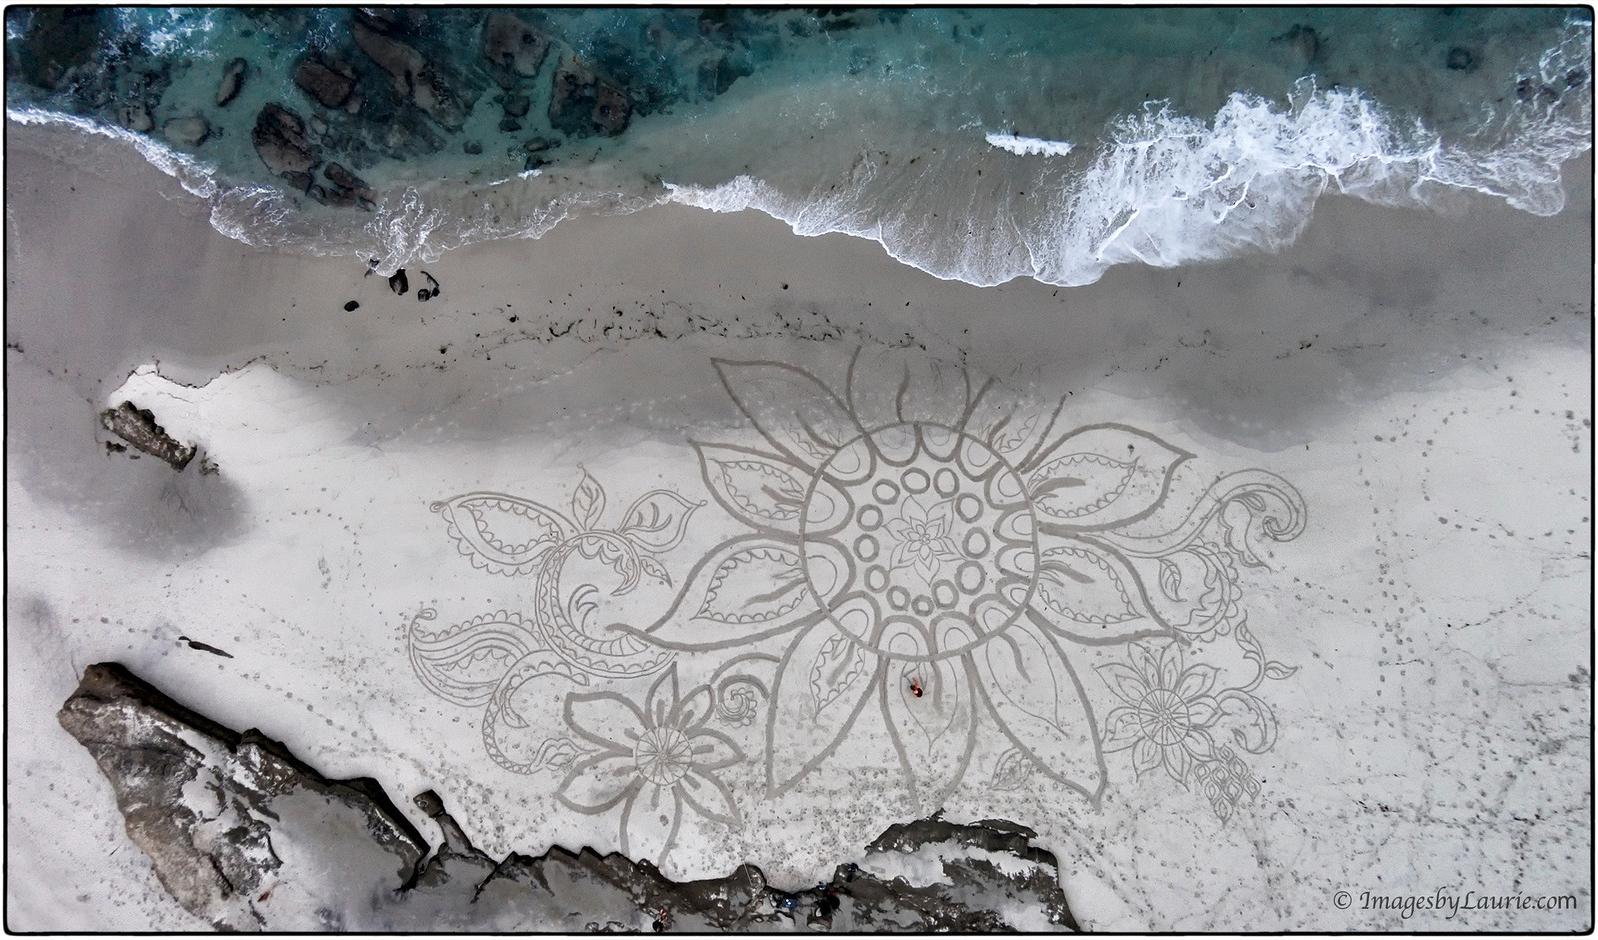 (Sand Art created by Diana Berti)